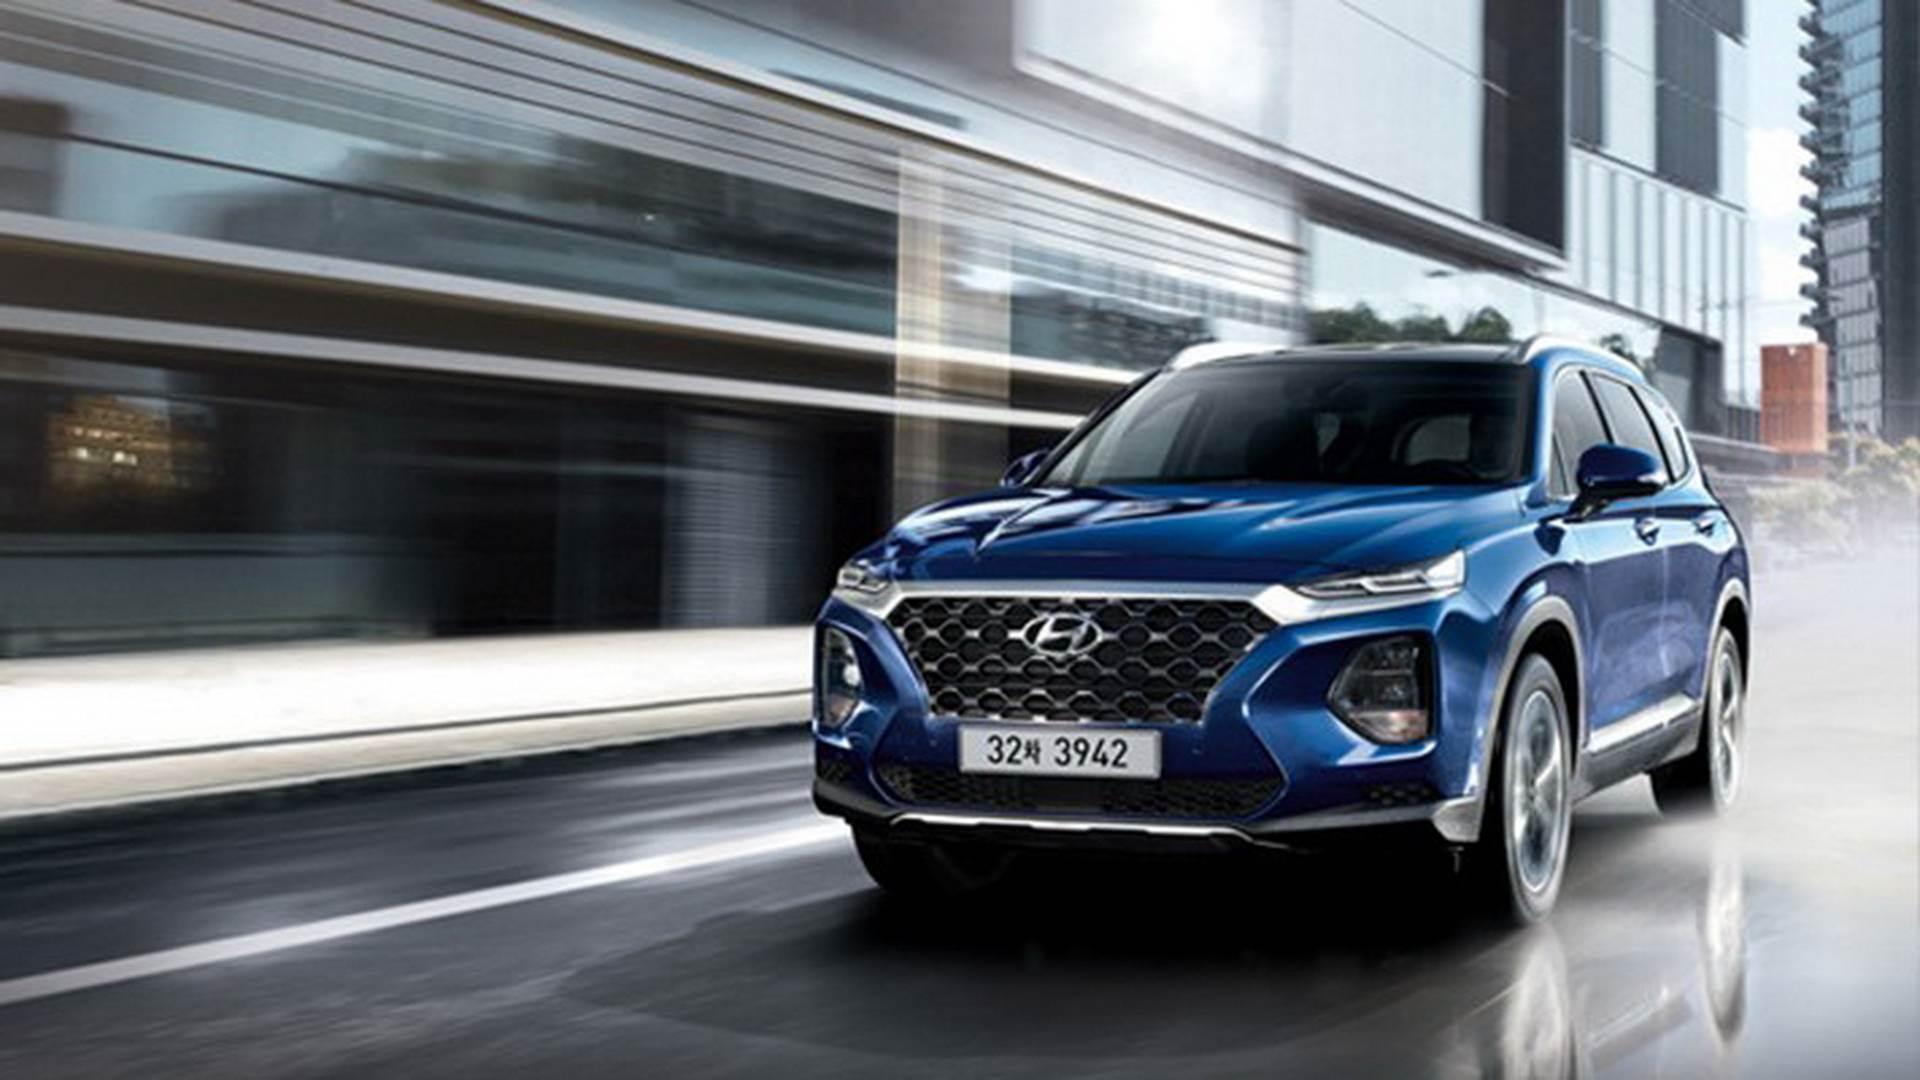 2018 Hyundai Santa Fe image gallery